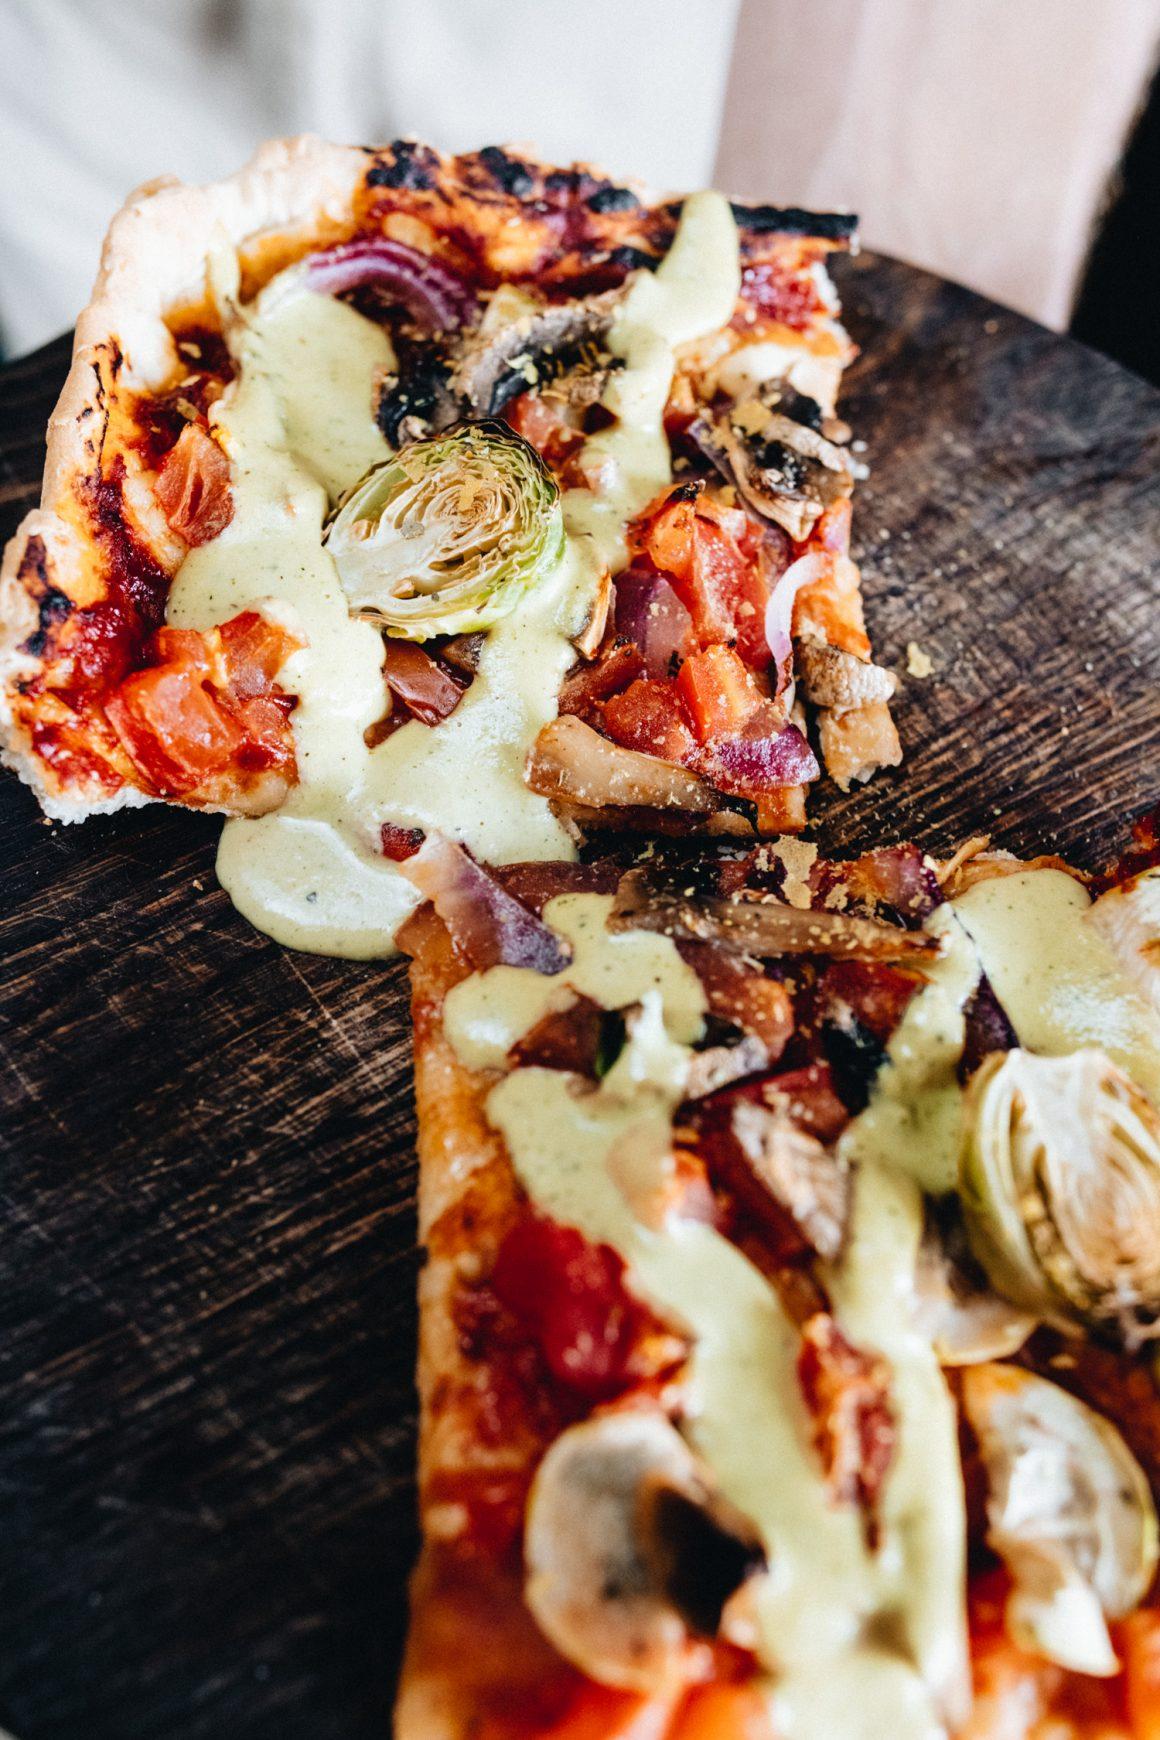 DSC 6829 2 1160x1740 - Italian Veggie Pizza